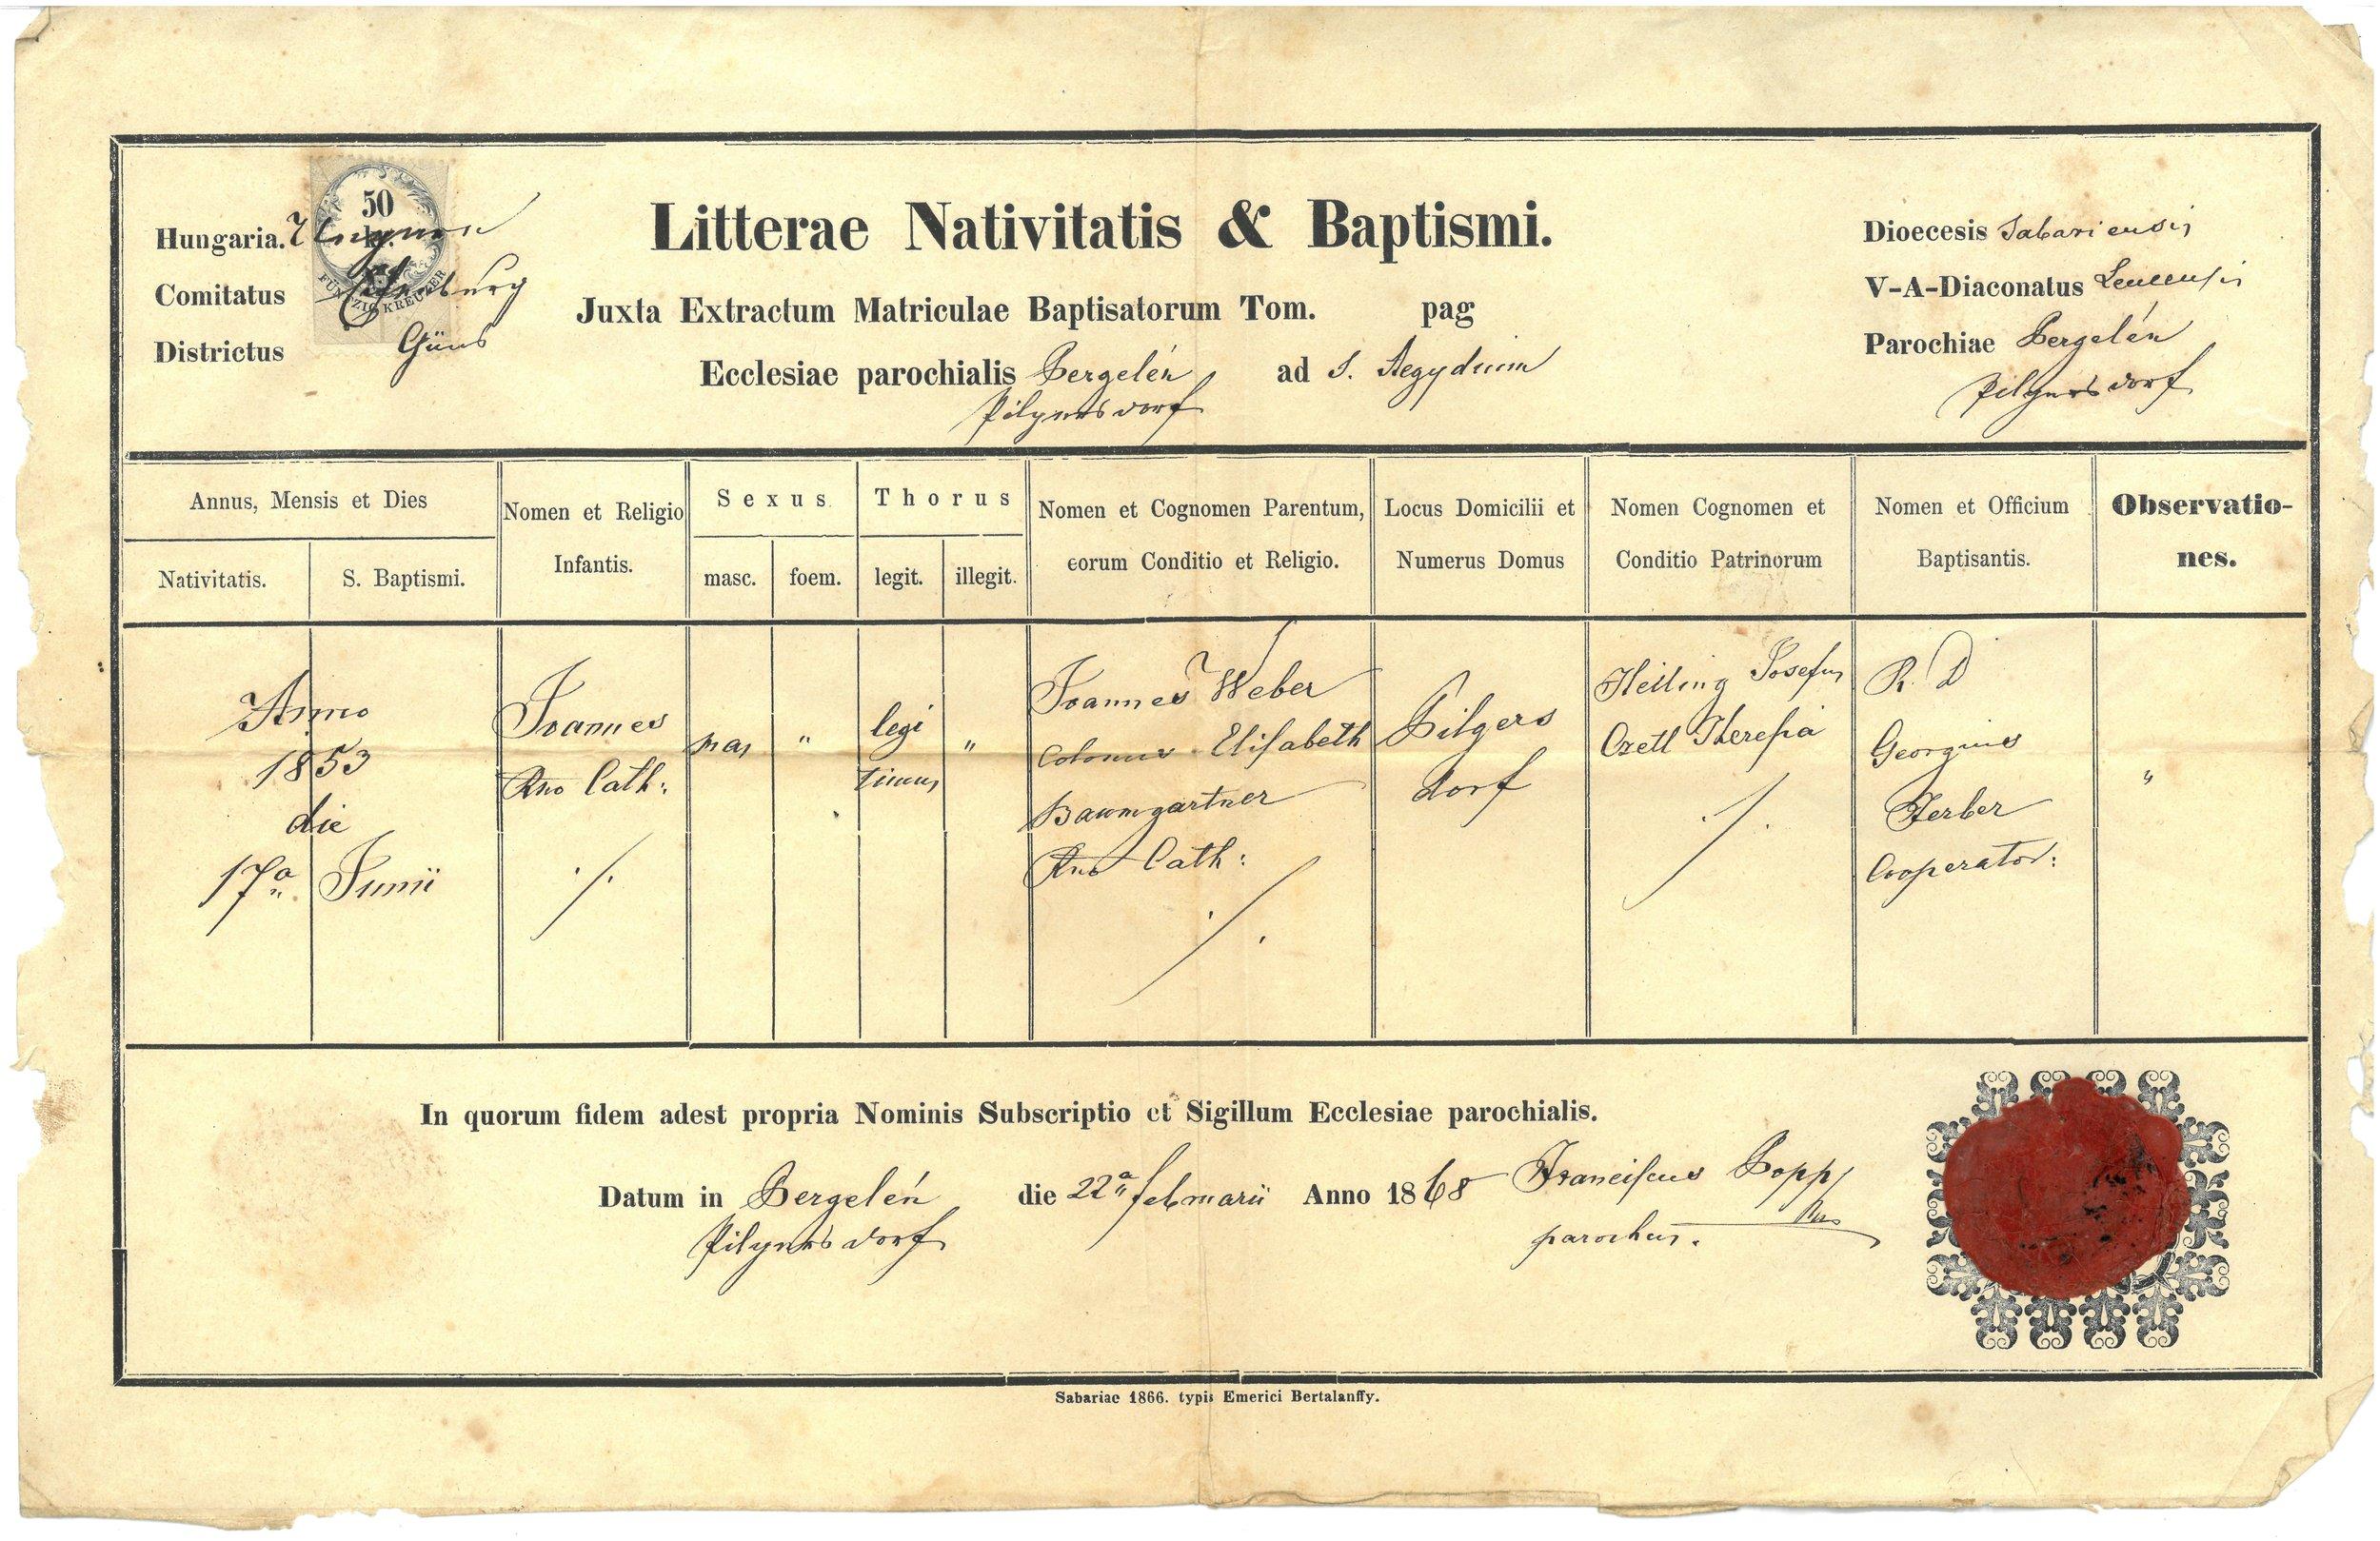 Johann Weber (Jr.) Baptismal Certificate, notarized copy from the Roman Catholic Church in Austria-Hungary, 1868. (Object ID# 2016.1726.213)